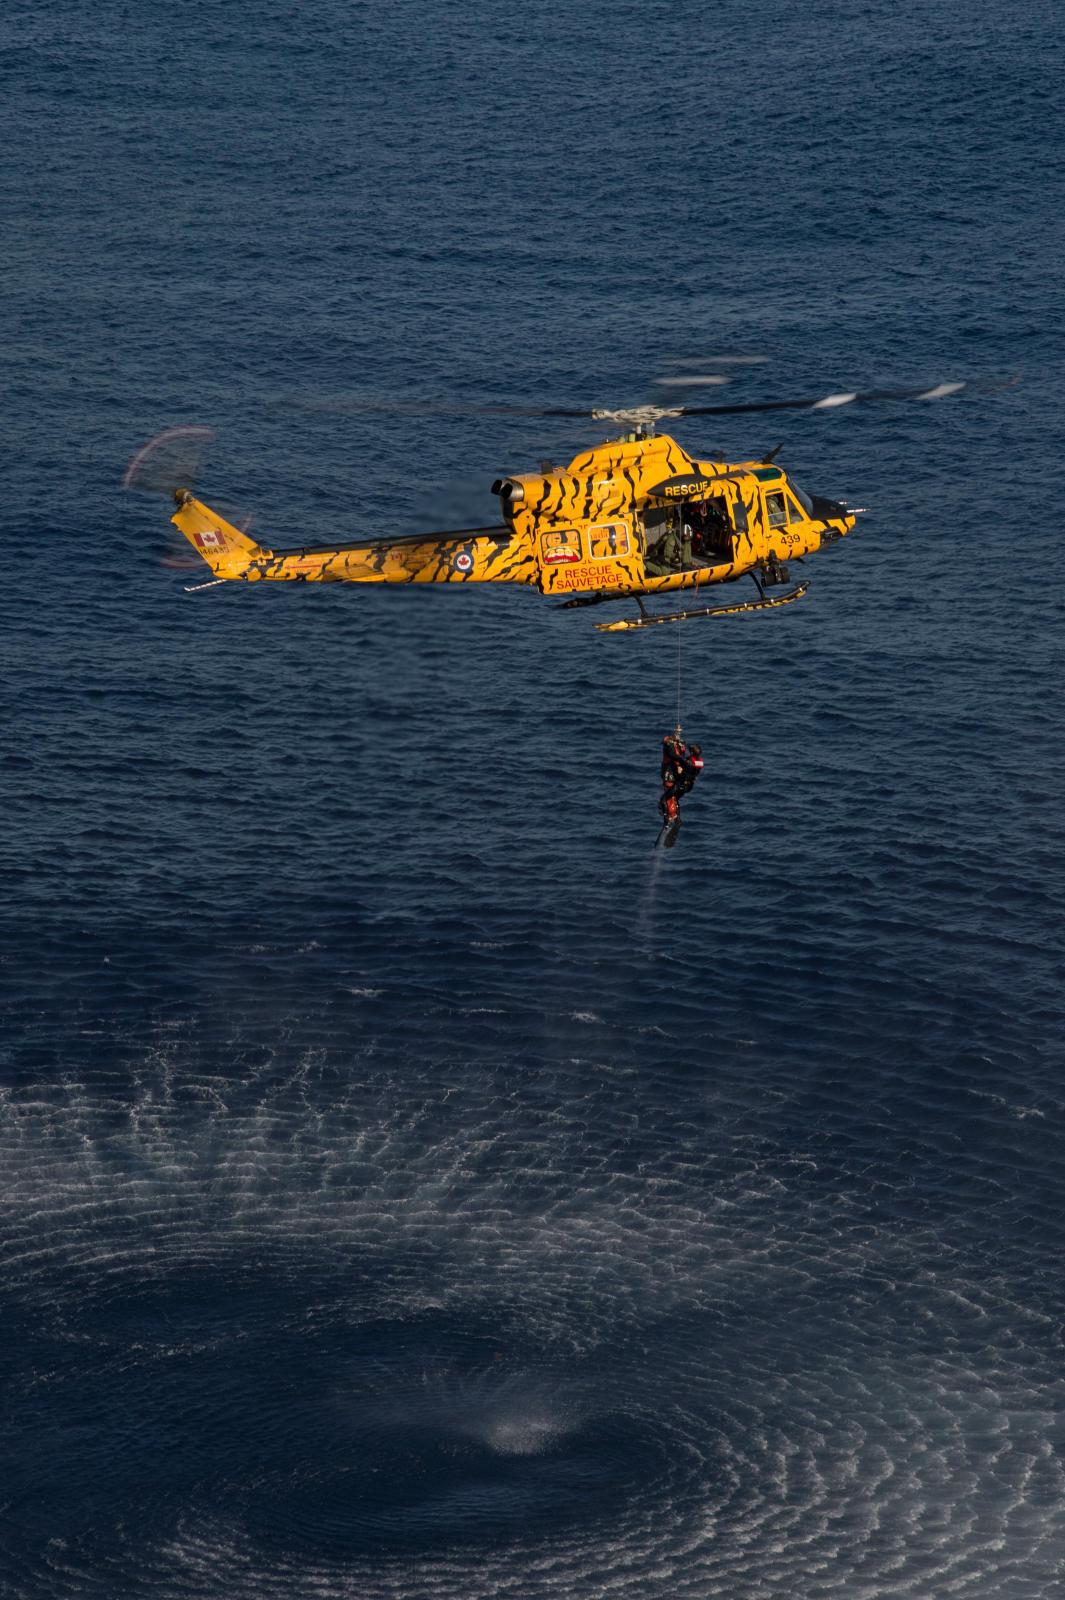 CH-146 Griffon SAR